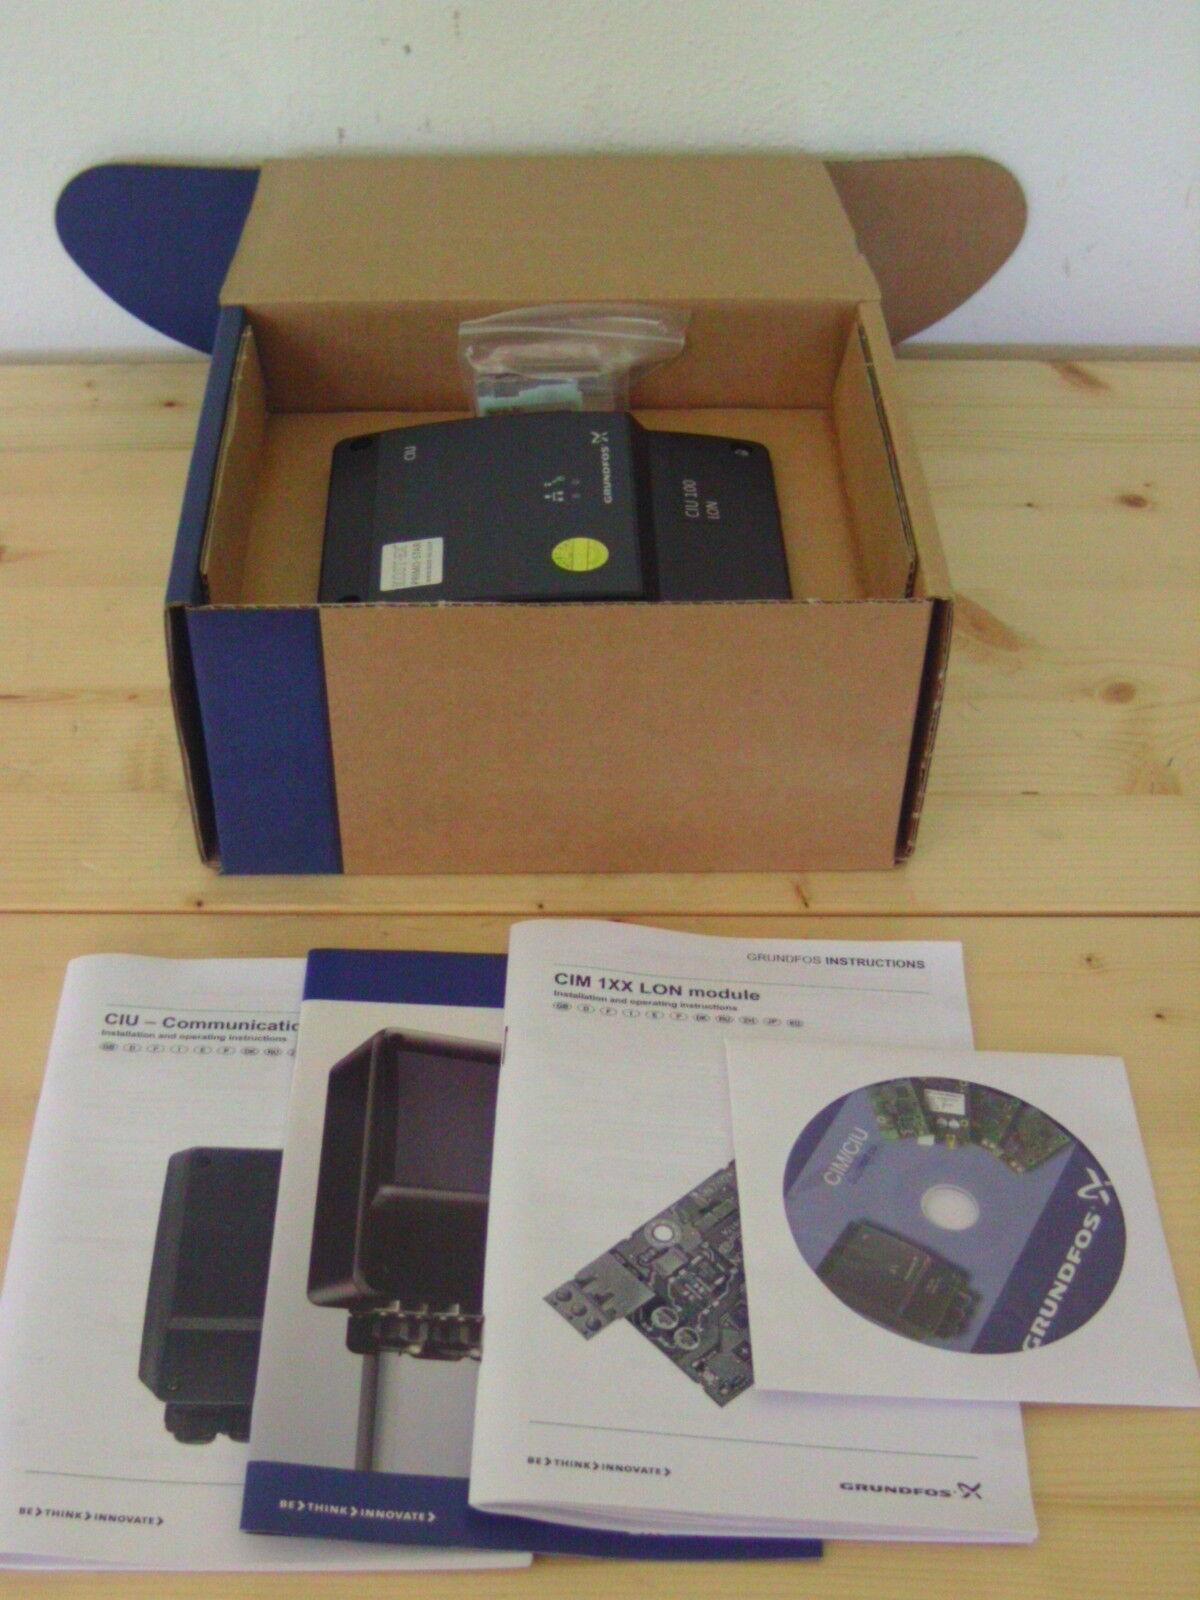 Grundfos Pumpenmodul MAGNA-CIU 100 LON Modul 96753735-V01 KOST-EX P13 512